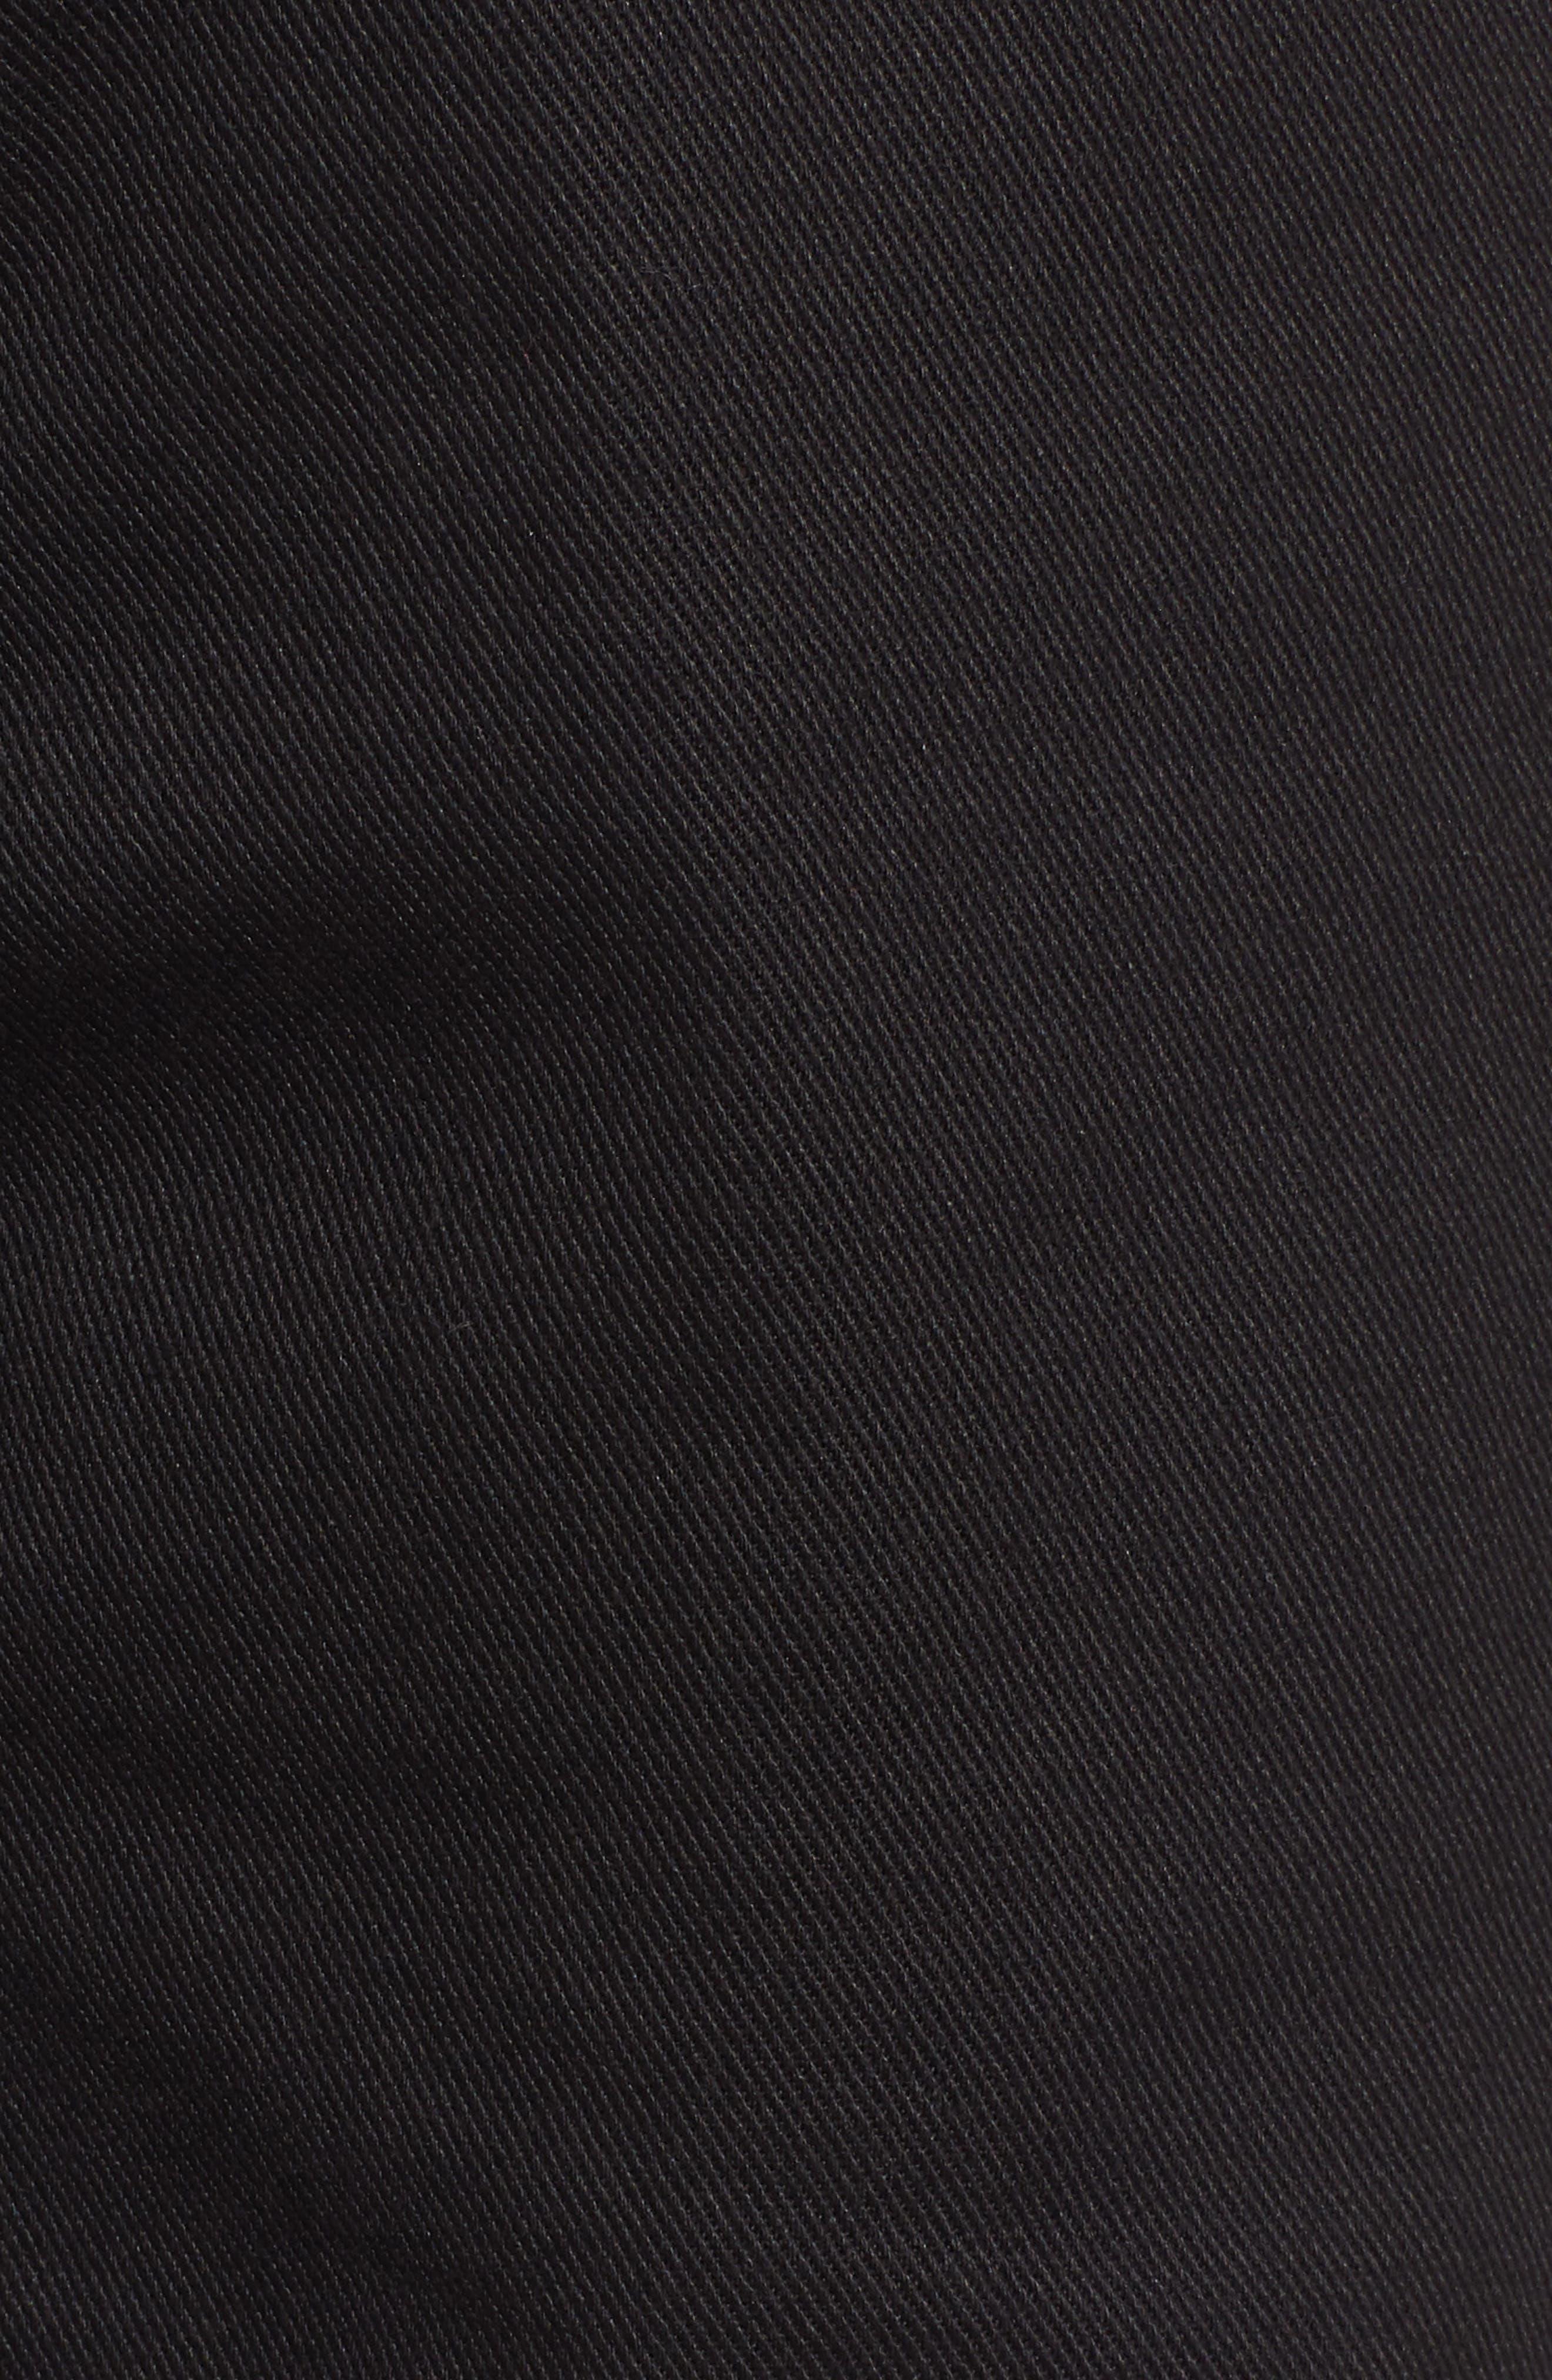 DICKIES, Relaxed Fit Carpenter Pants, Alternate thumbnail 6, color, BLACK